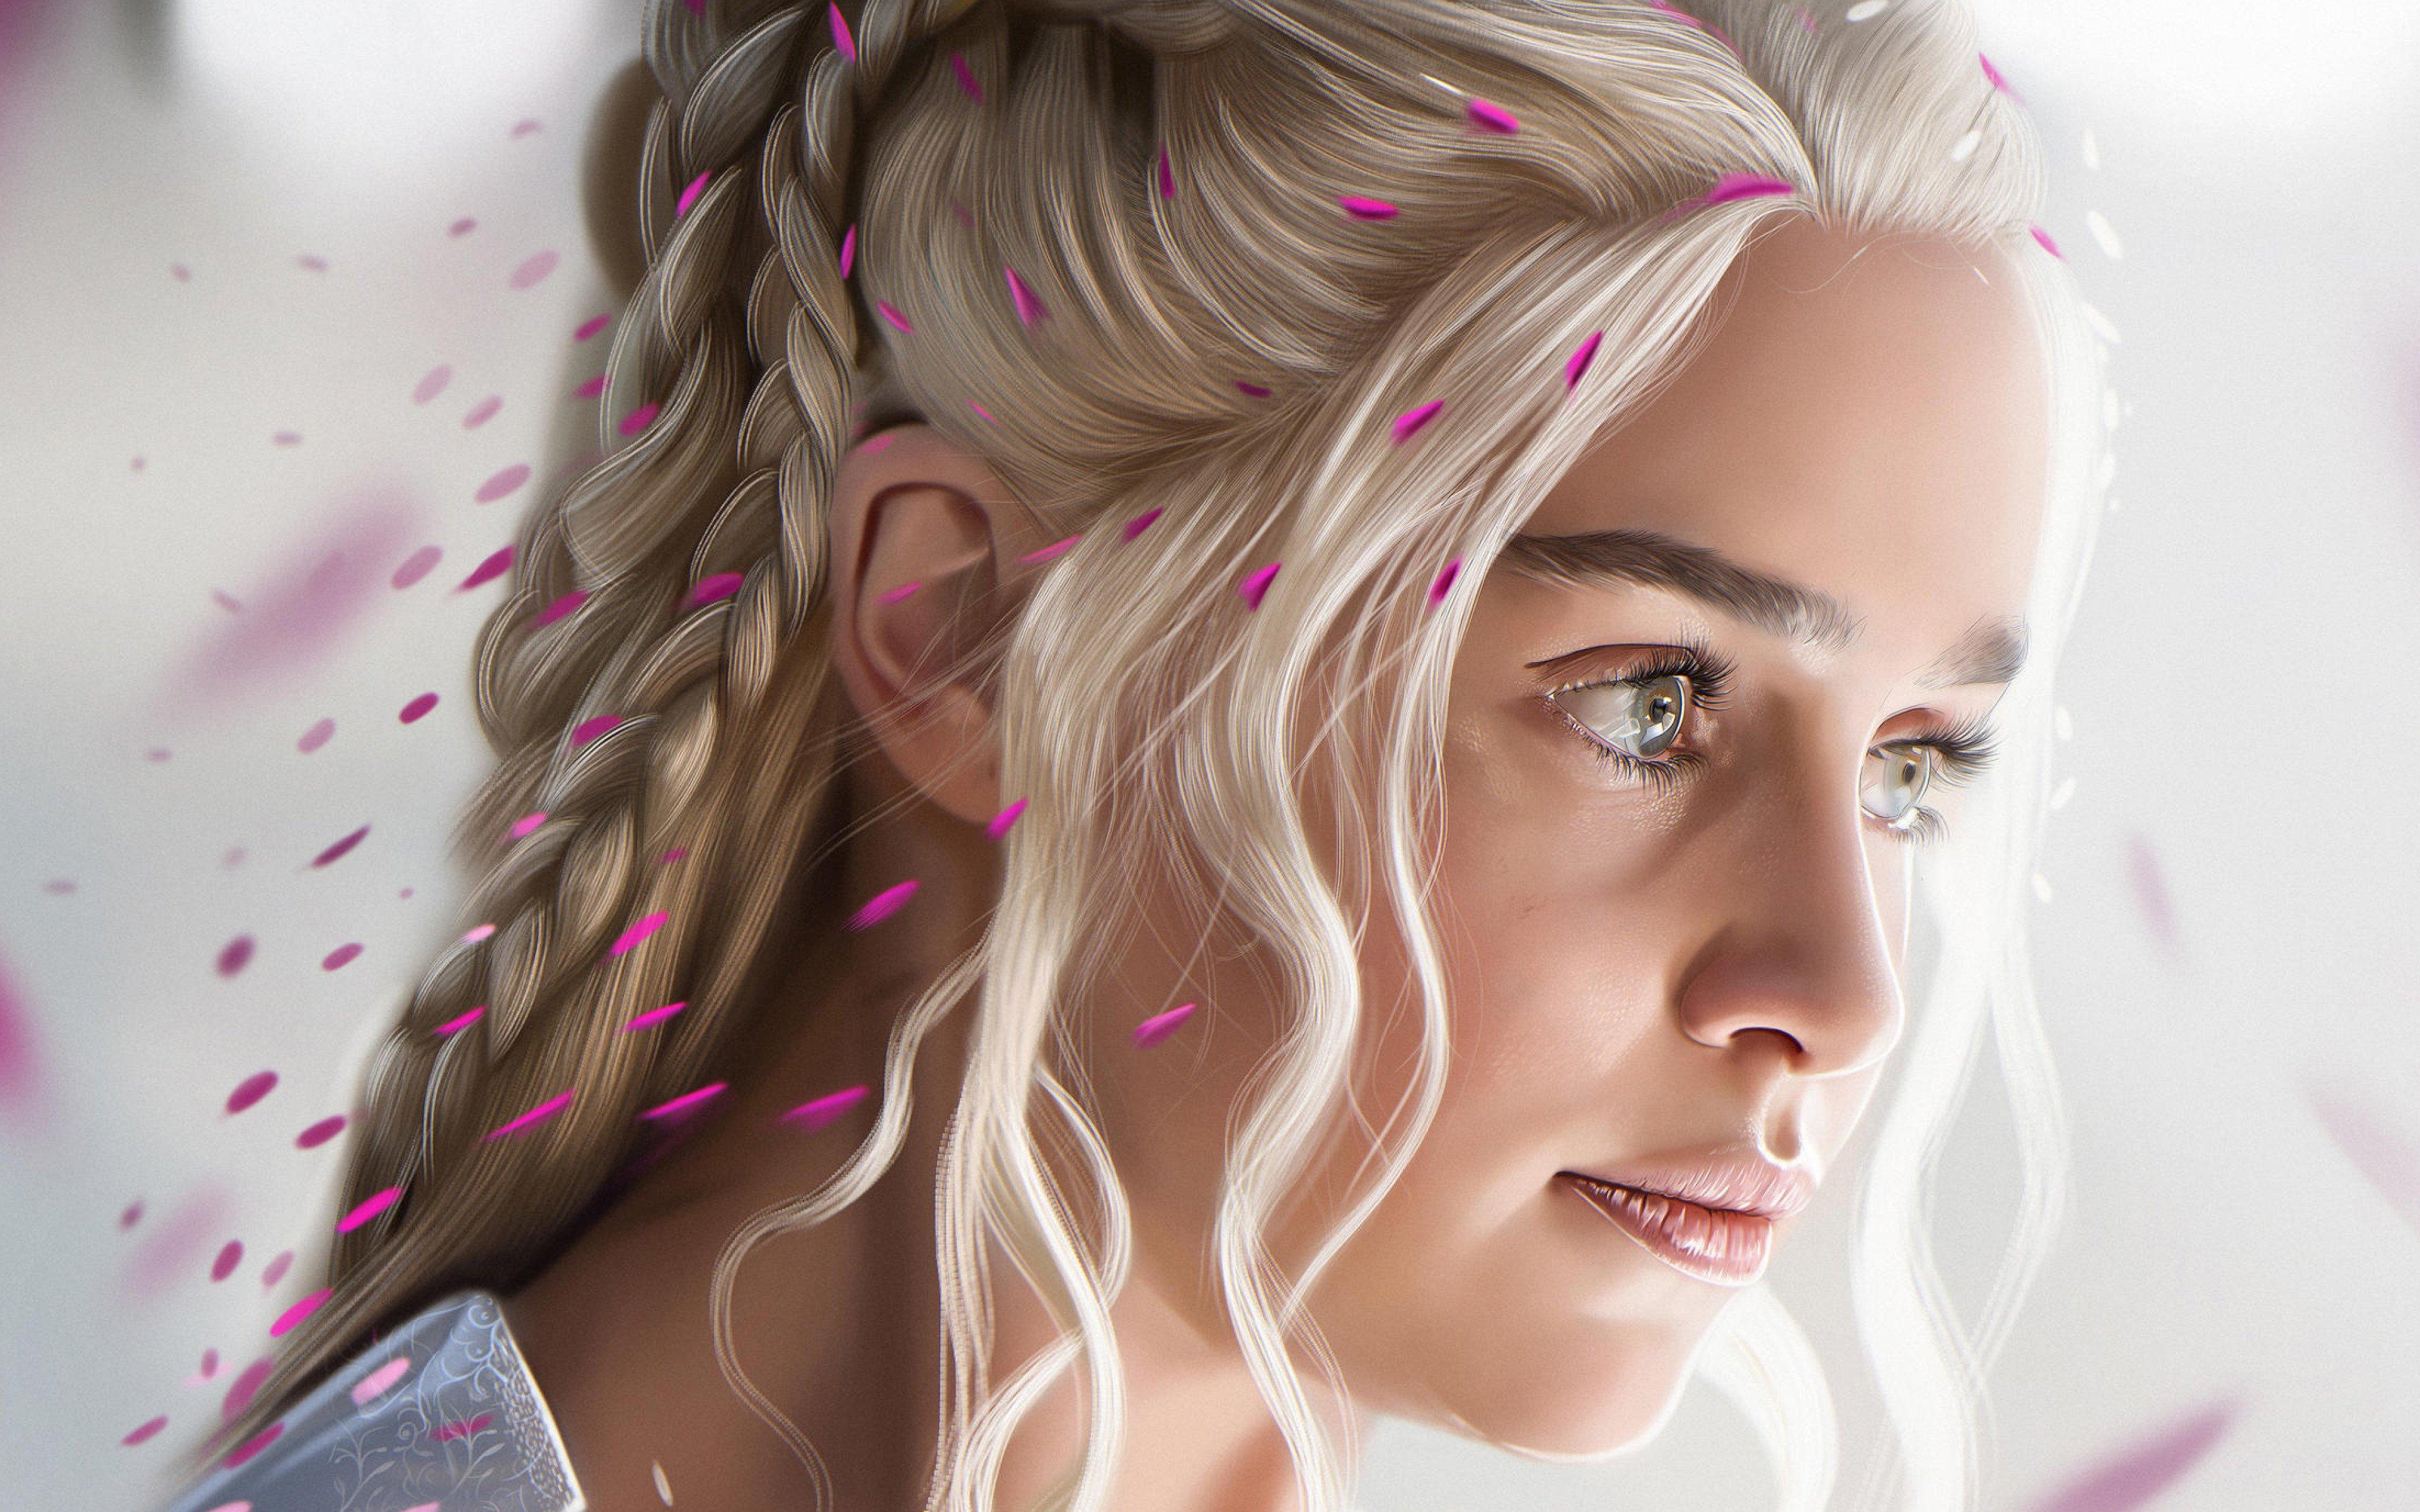 Fondos de pantalla Daenerys Targaryen Arte digital